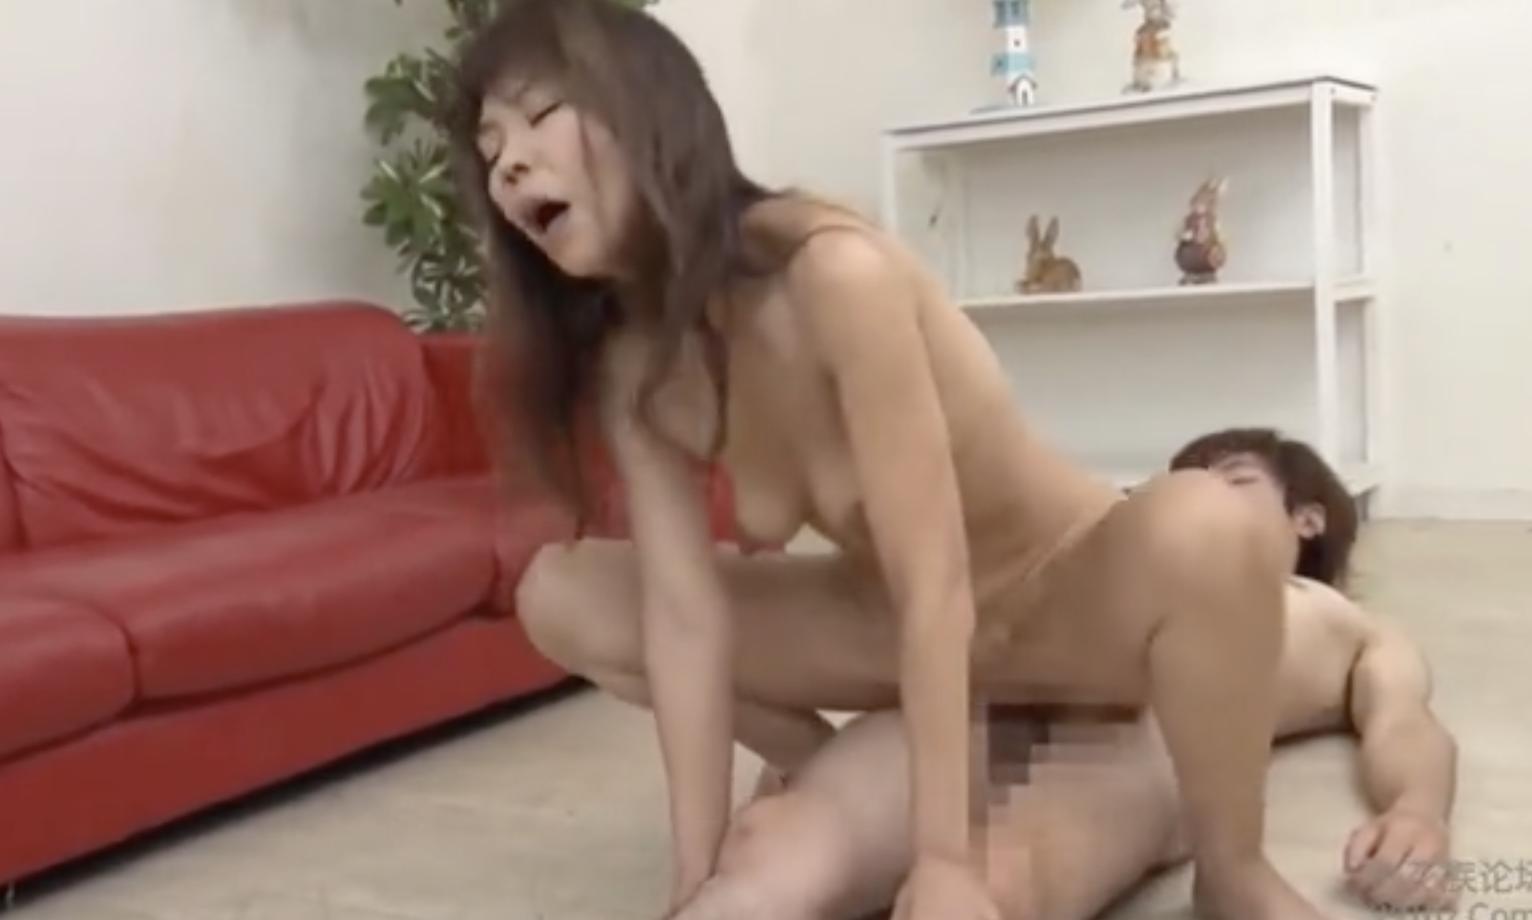 http://share-videos.se/auto/video/74791860?uid=13